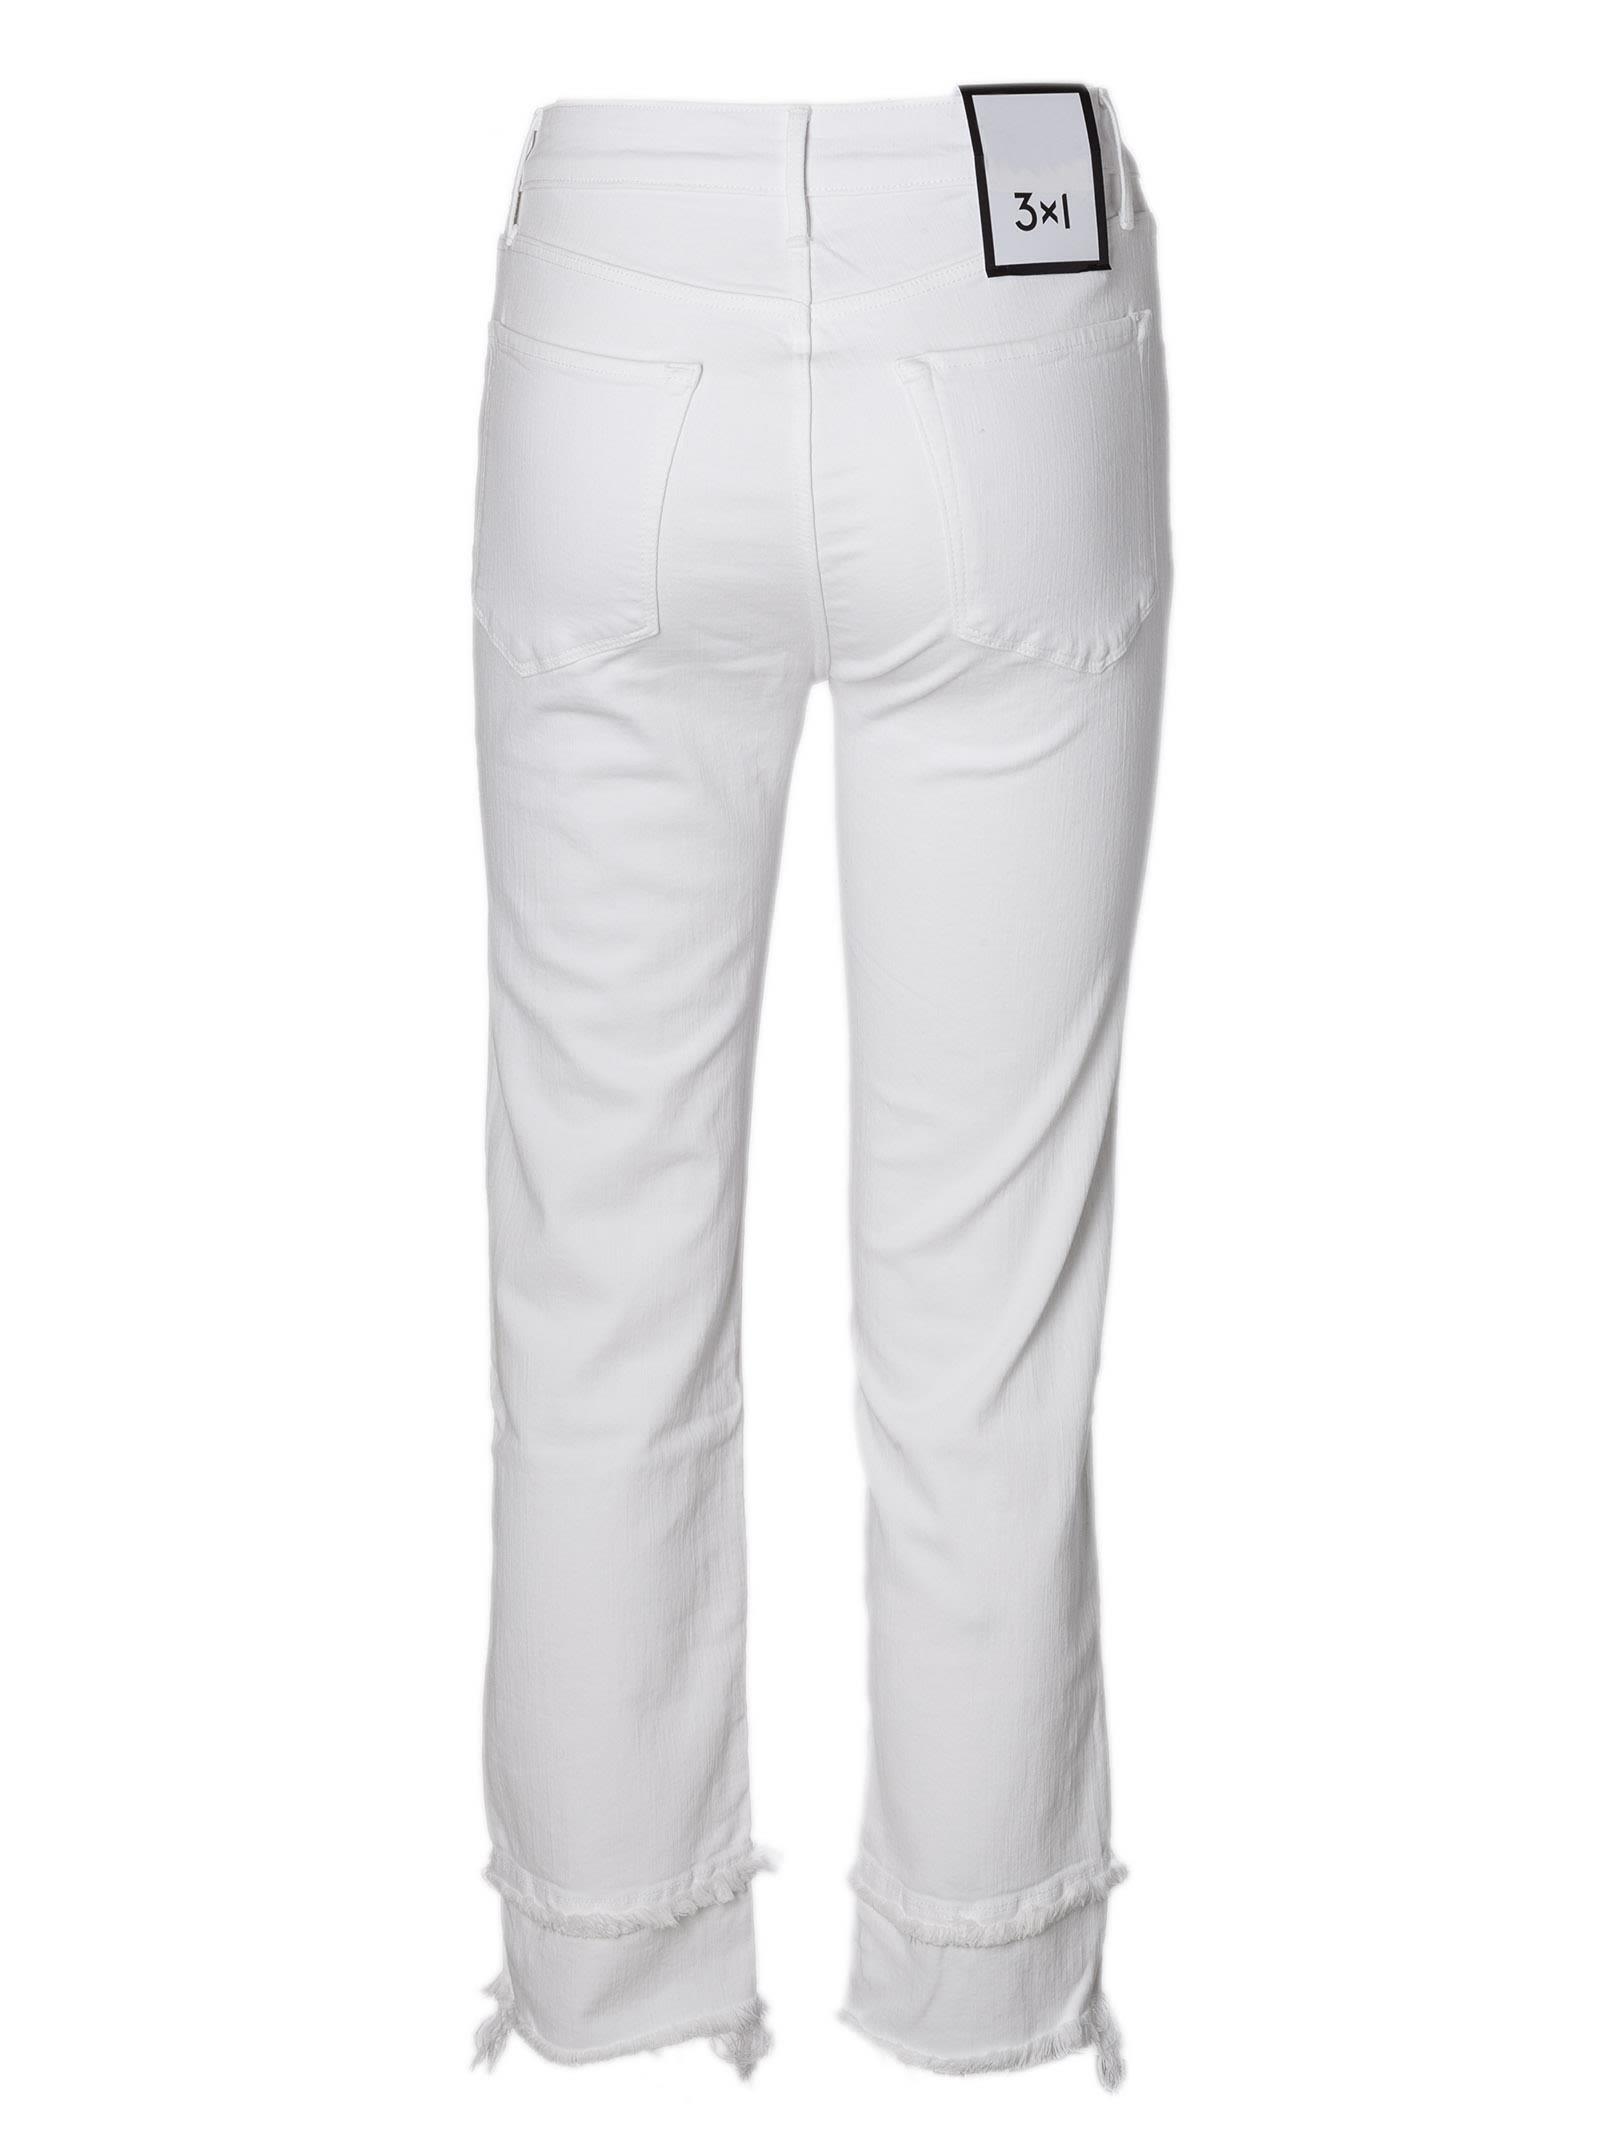 frayed trim jeans - White 3x1 8iMJXrg